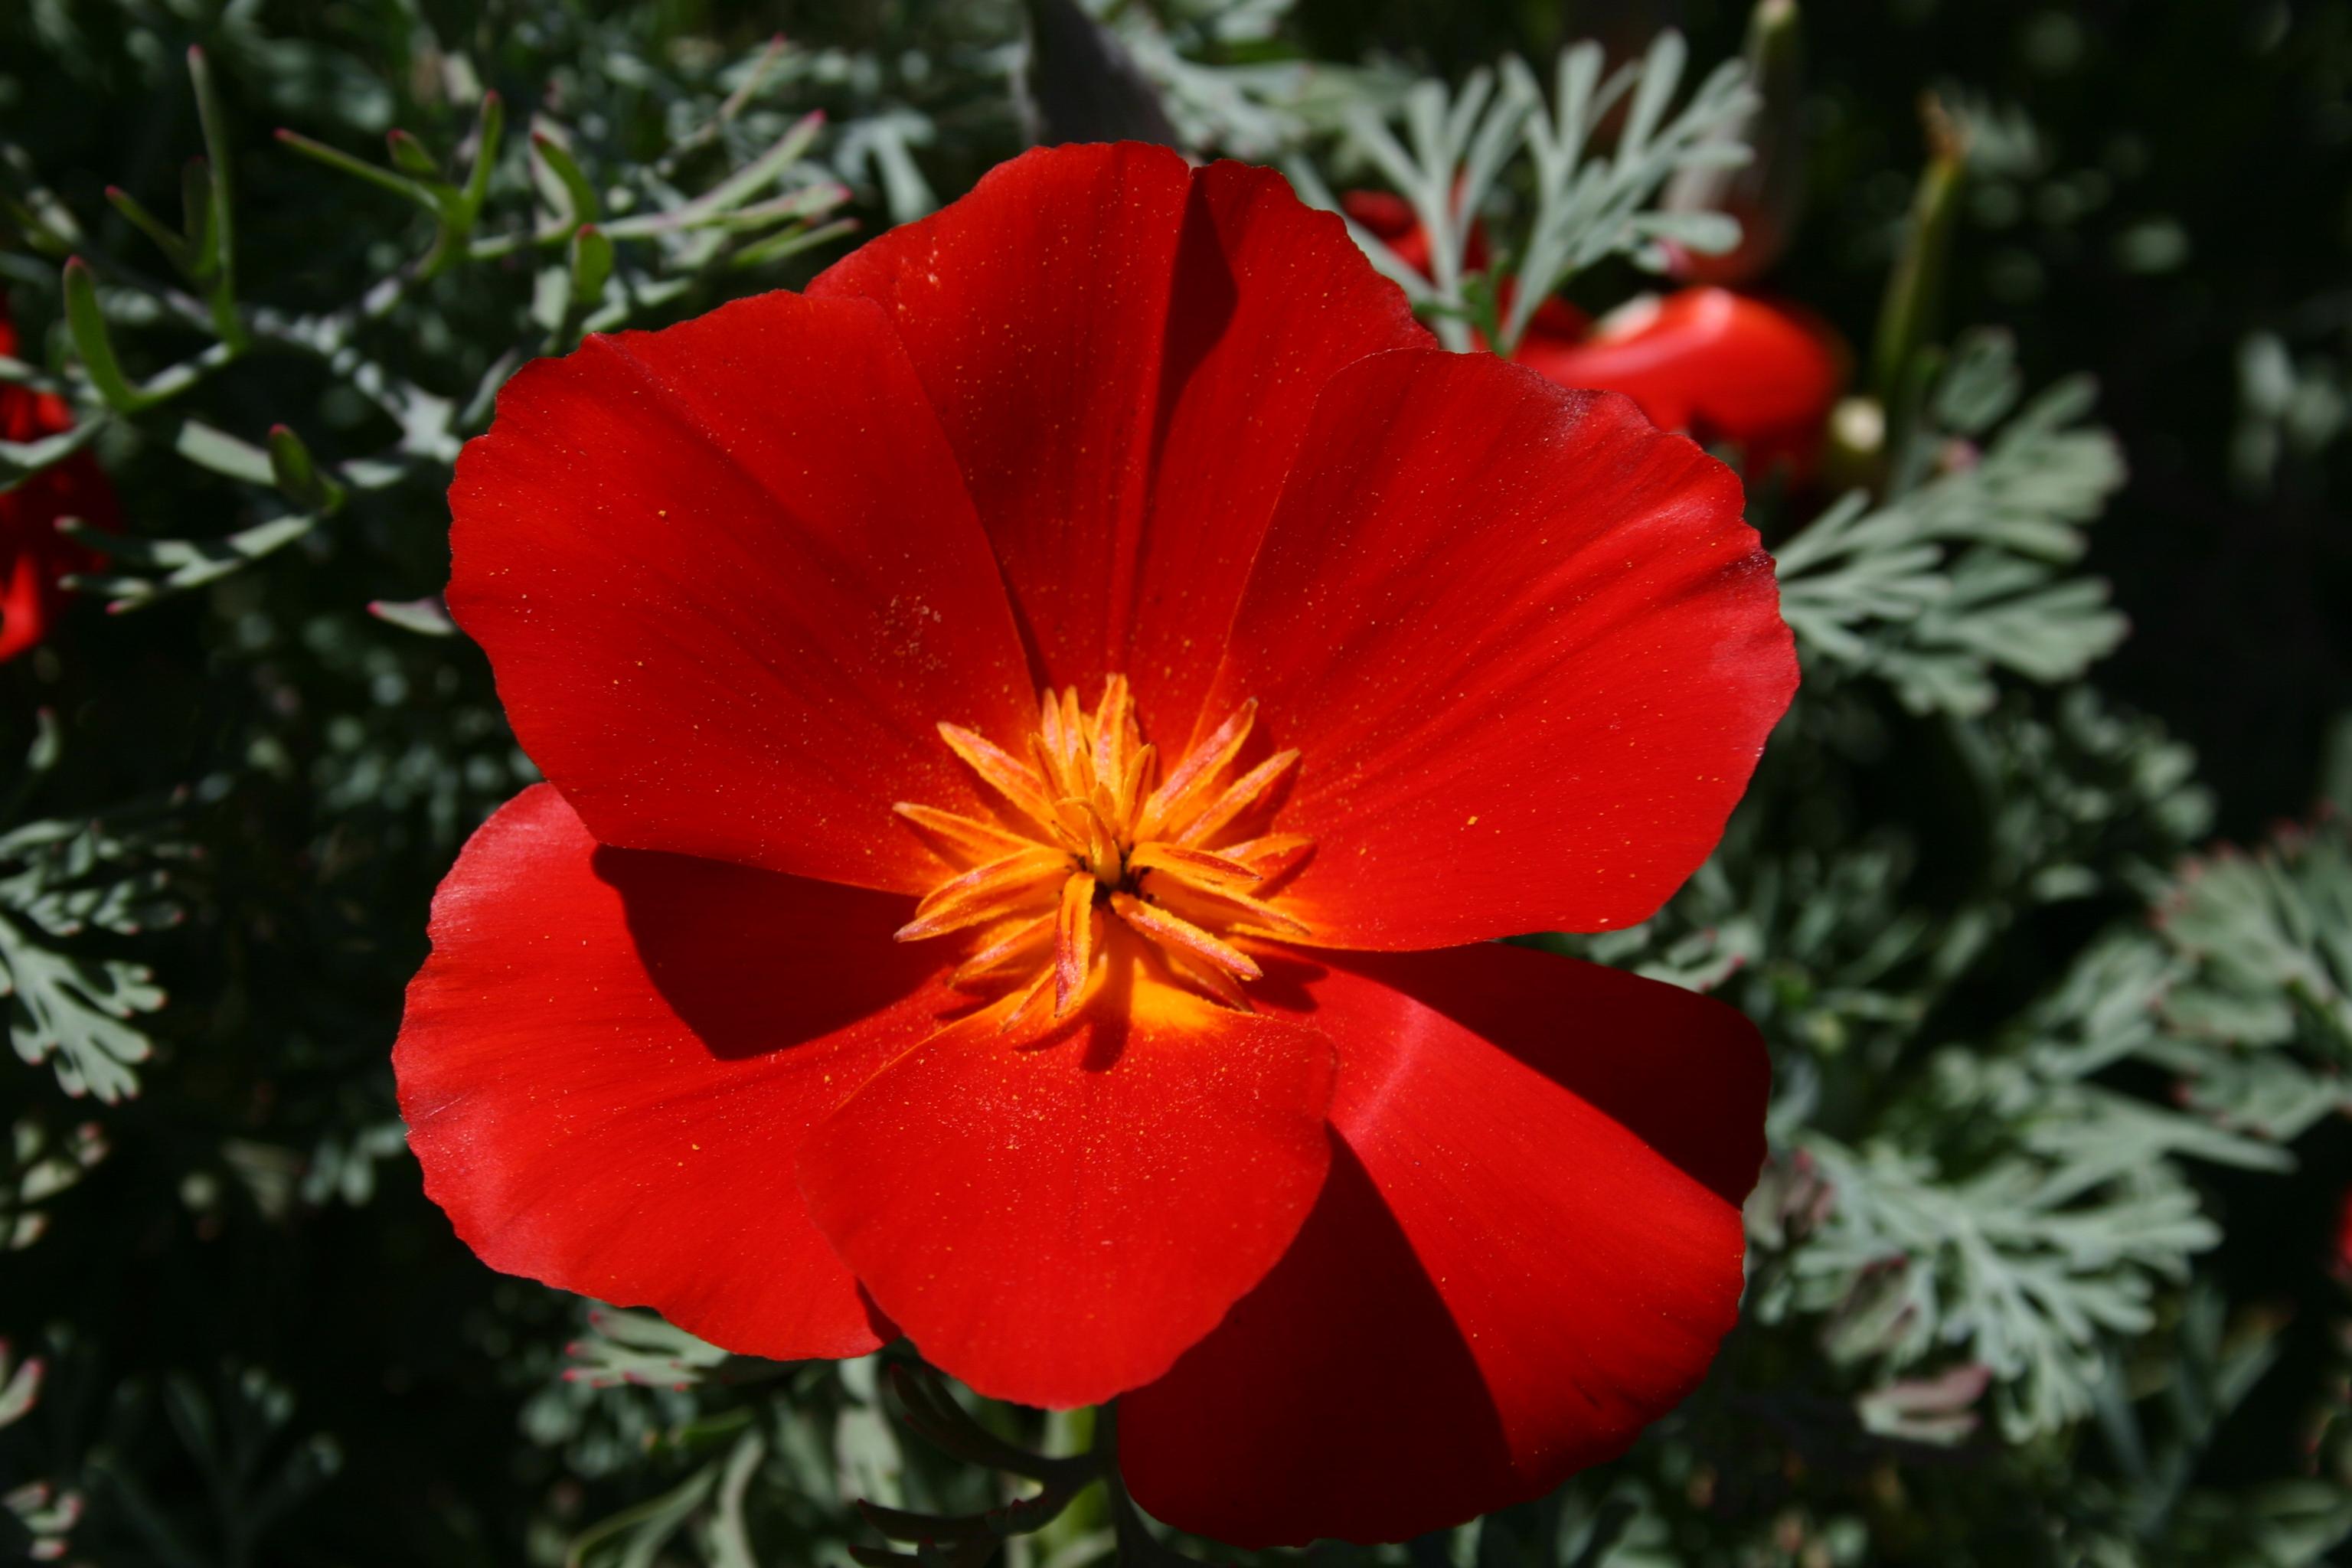 Poppy California Red Chief Oregon Wholesale Seed Company